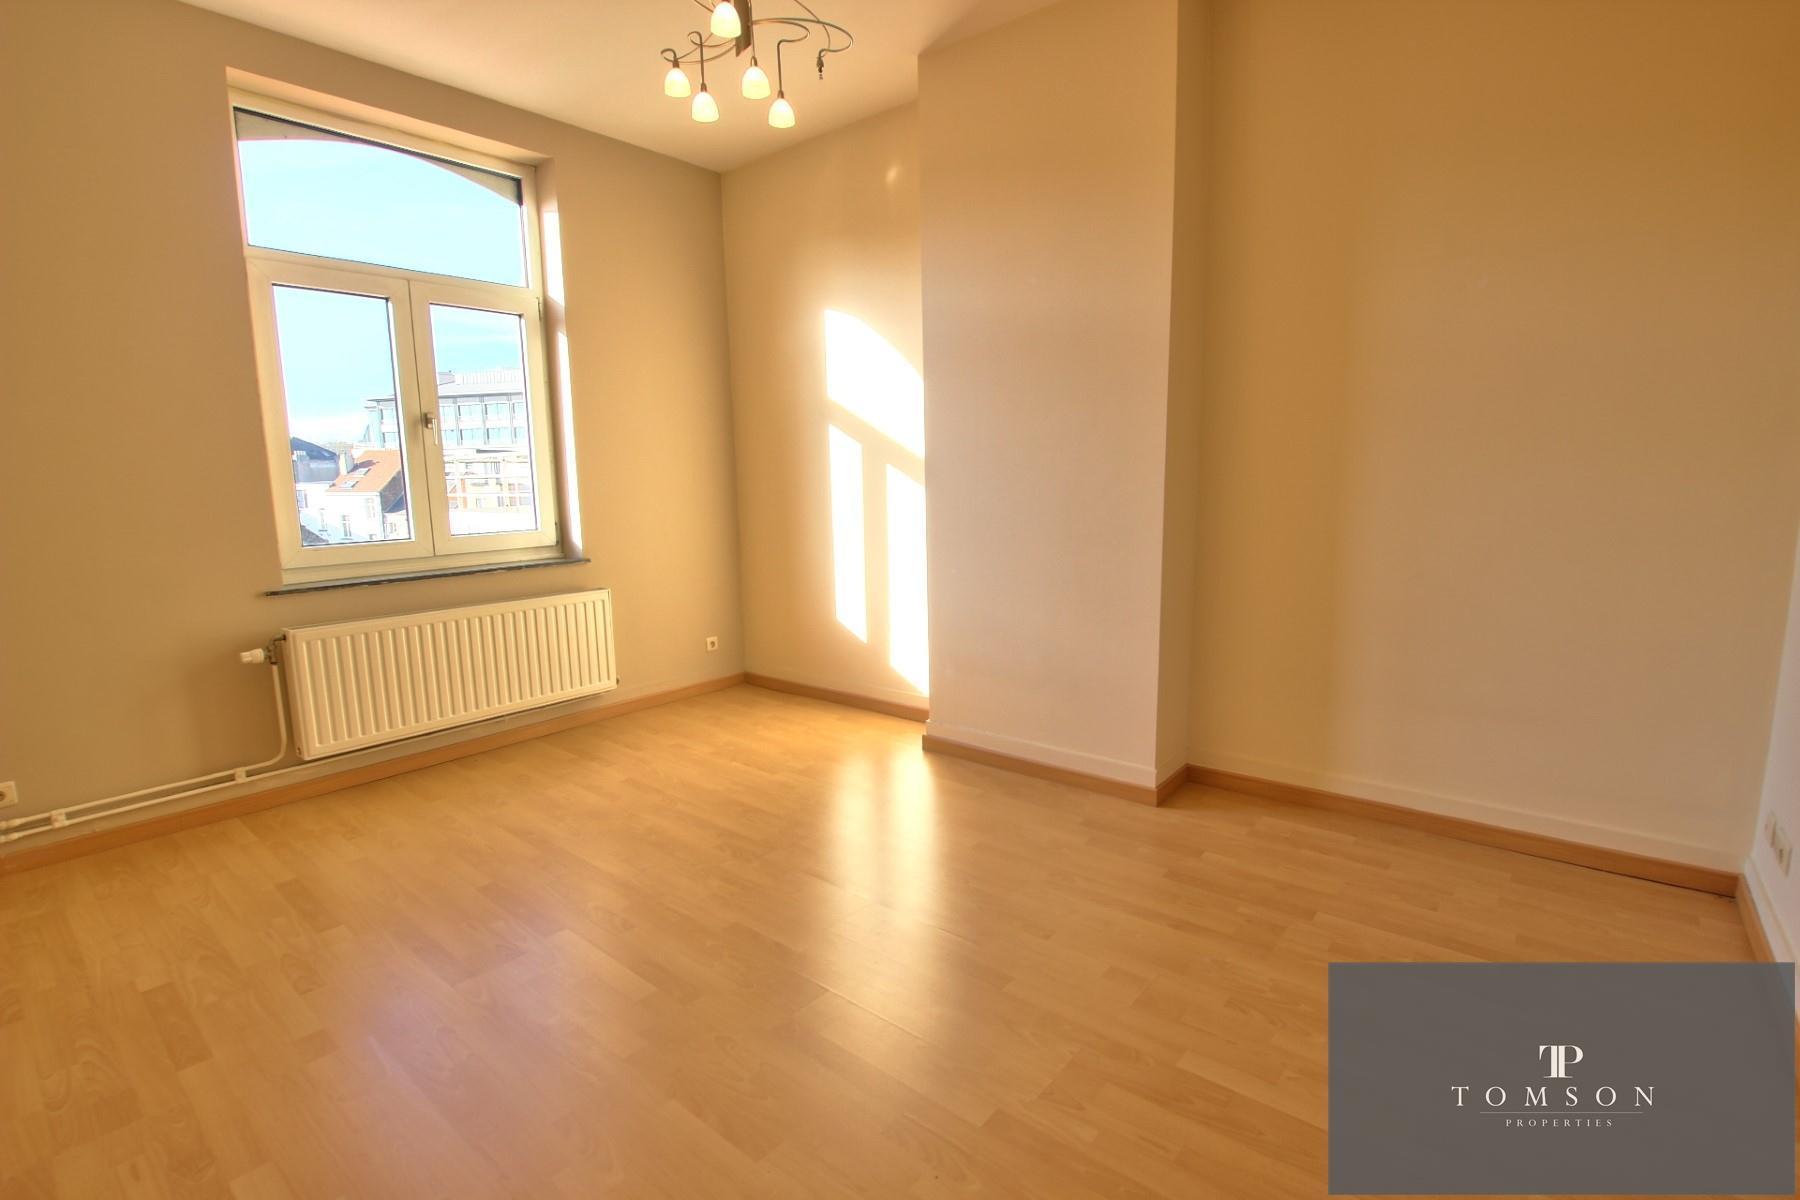 Flat - Etterbeek - #4130587-3